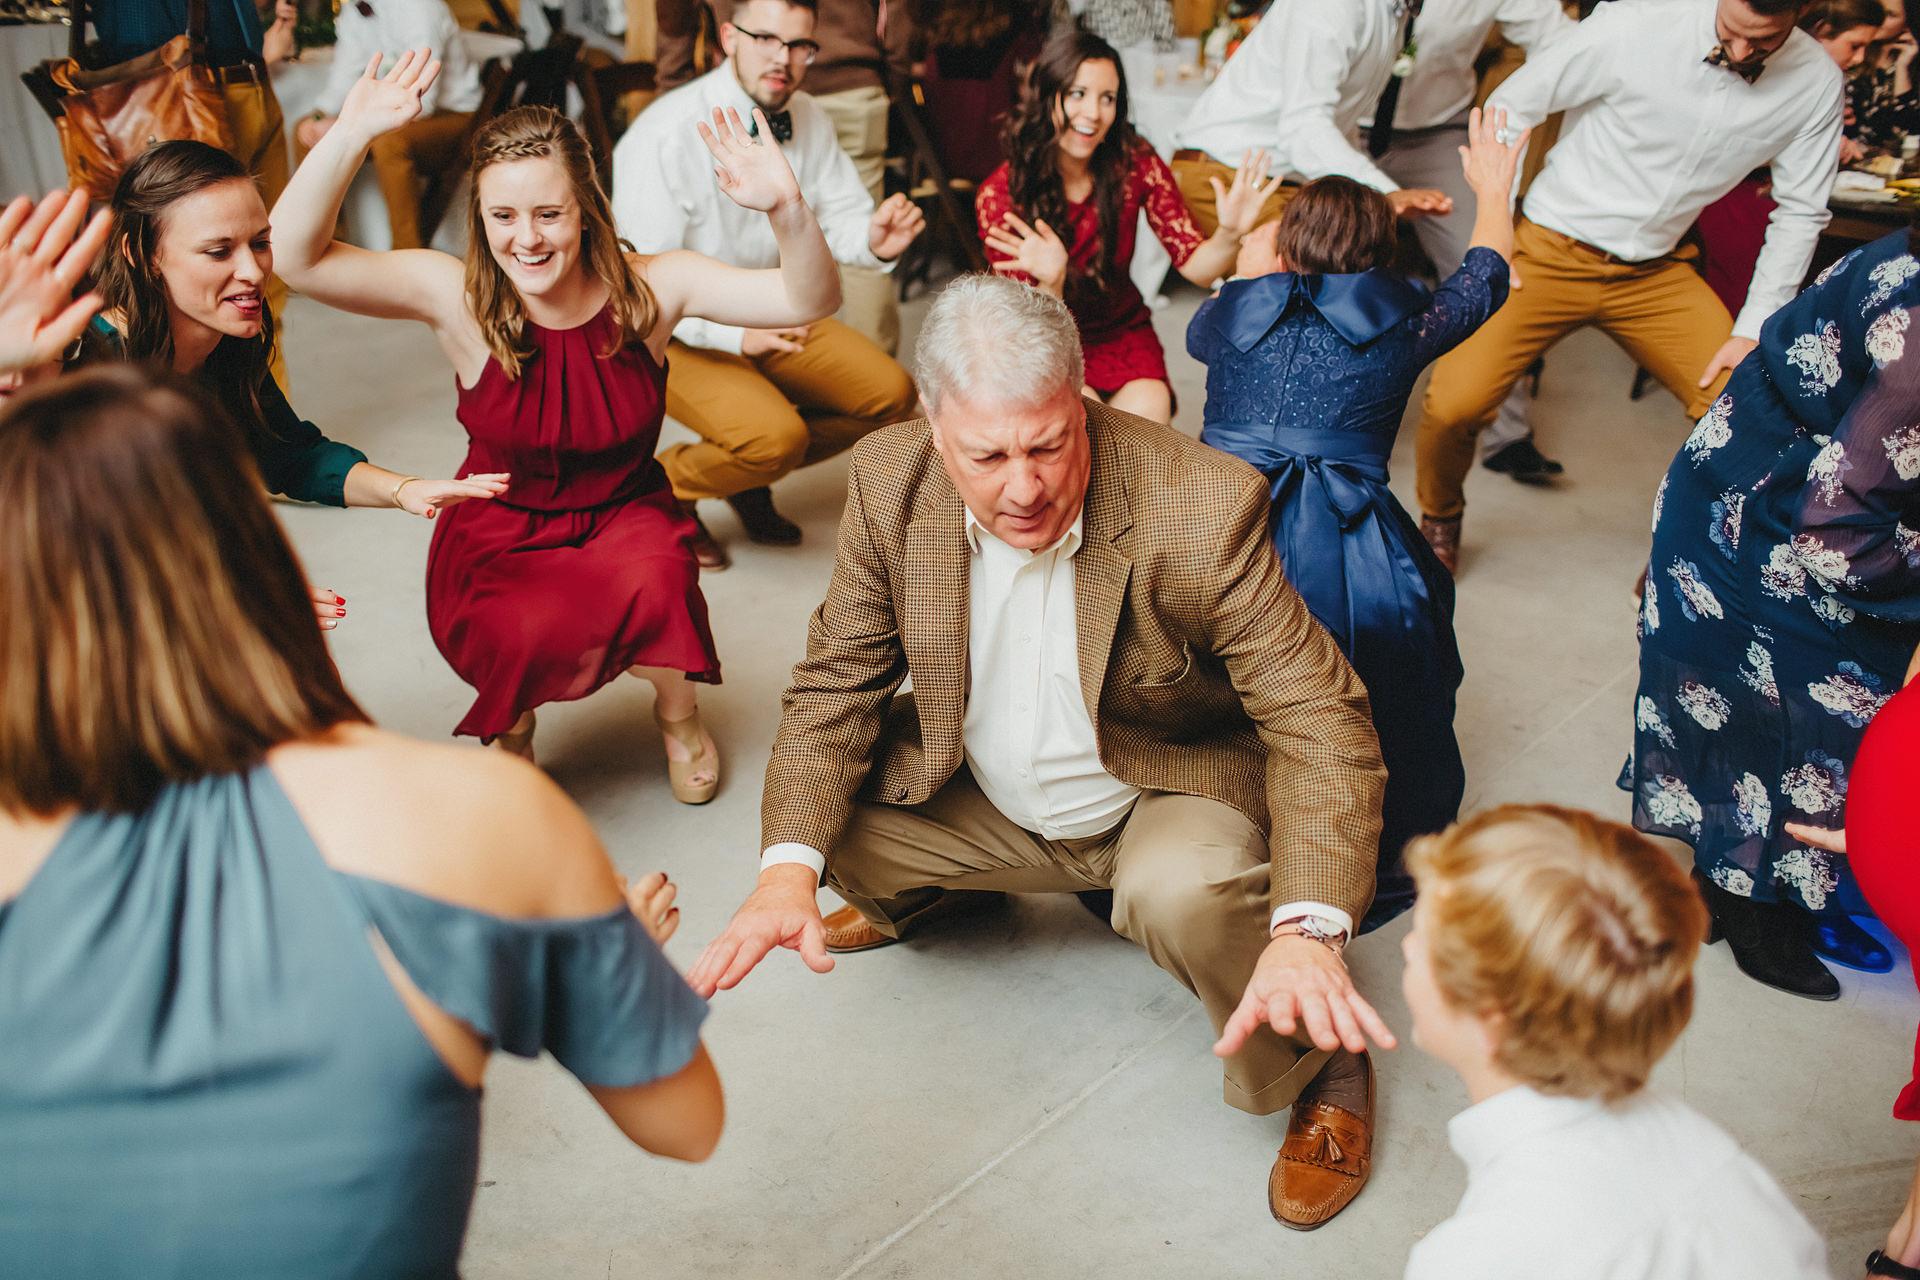 travis-hallmark-sarah-the-addison-grove-austin-wedding-photographers-00357.jpg